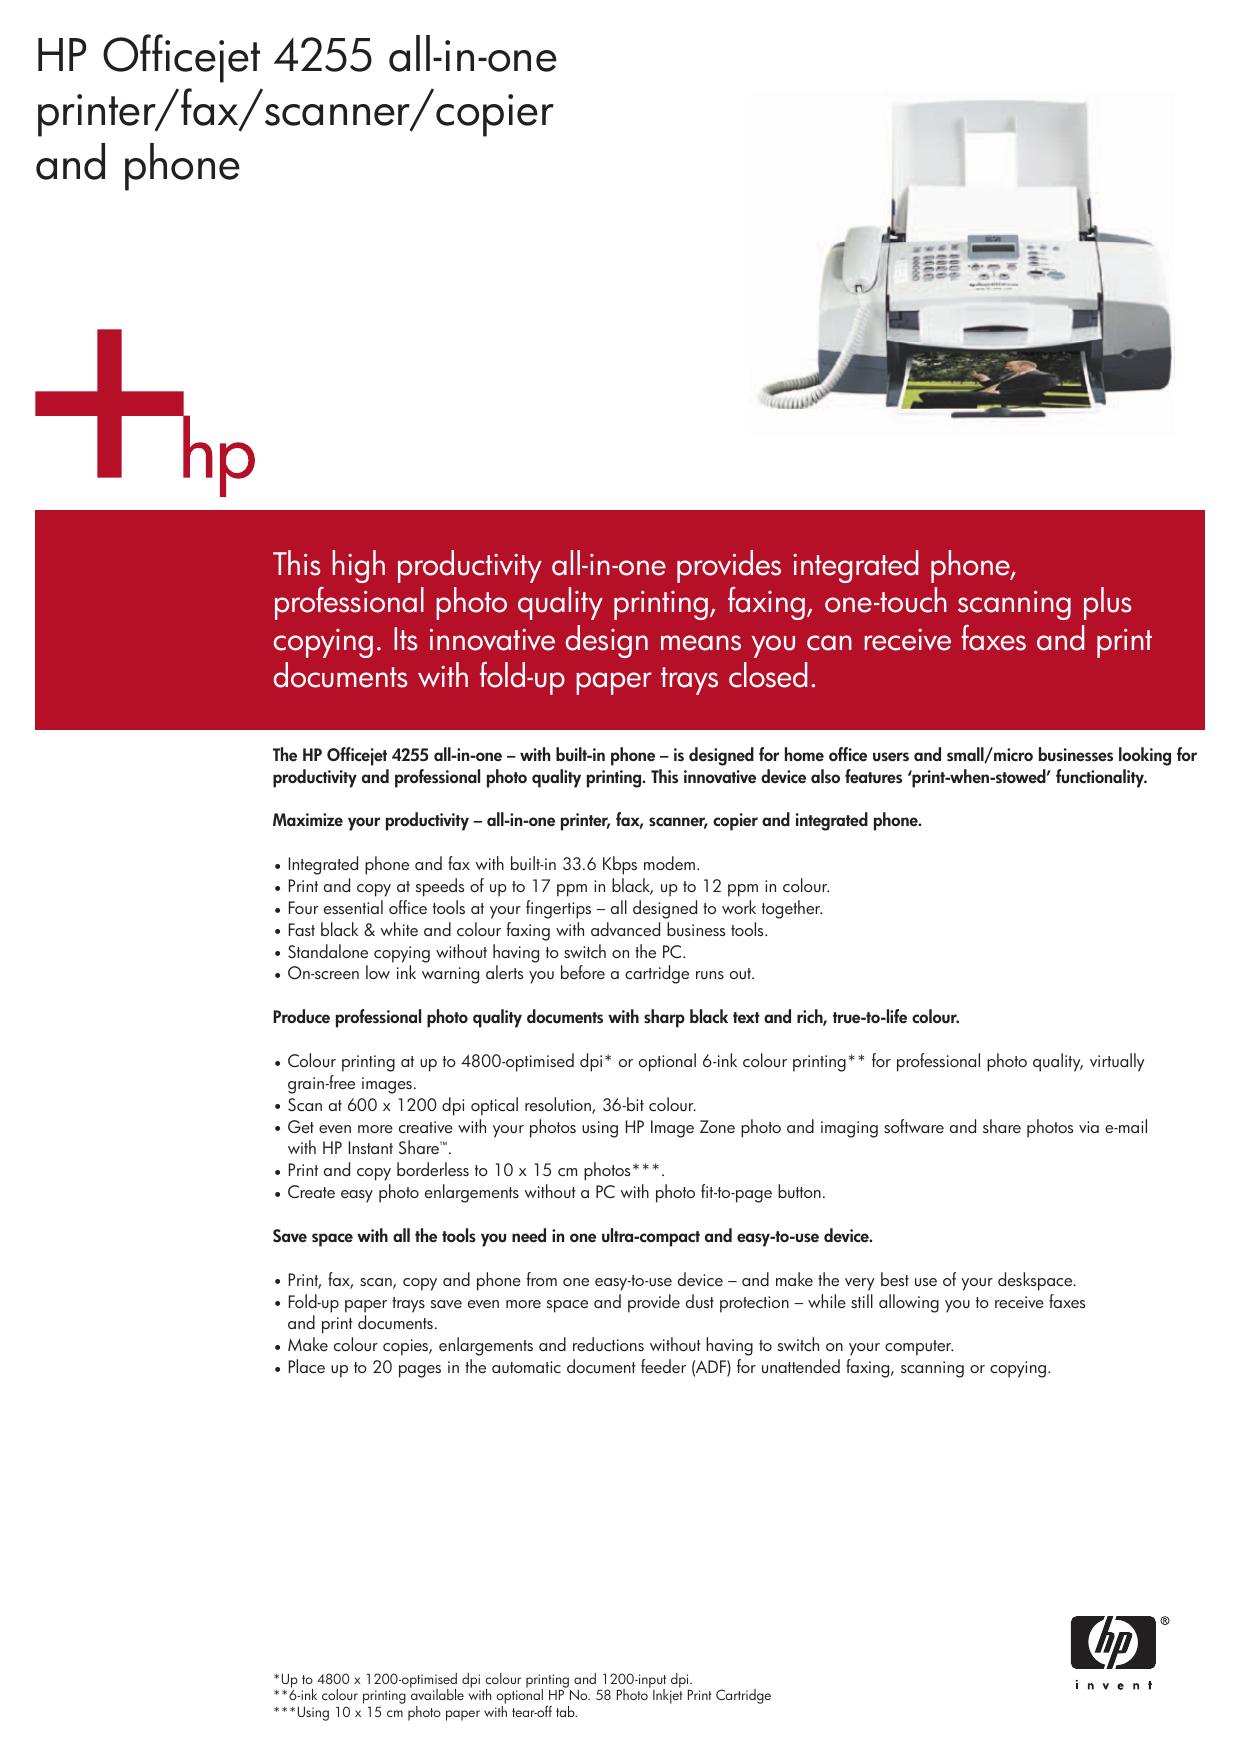 HP Officejet 4255 all-in-one printer/fax/scanner/copier   manualzz.com